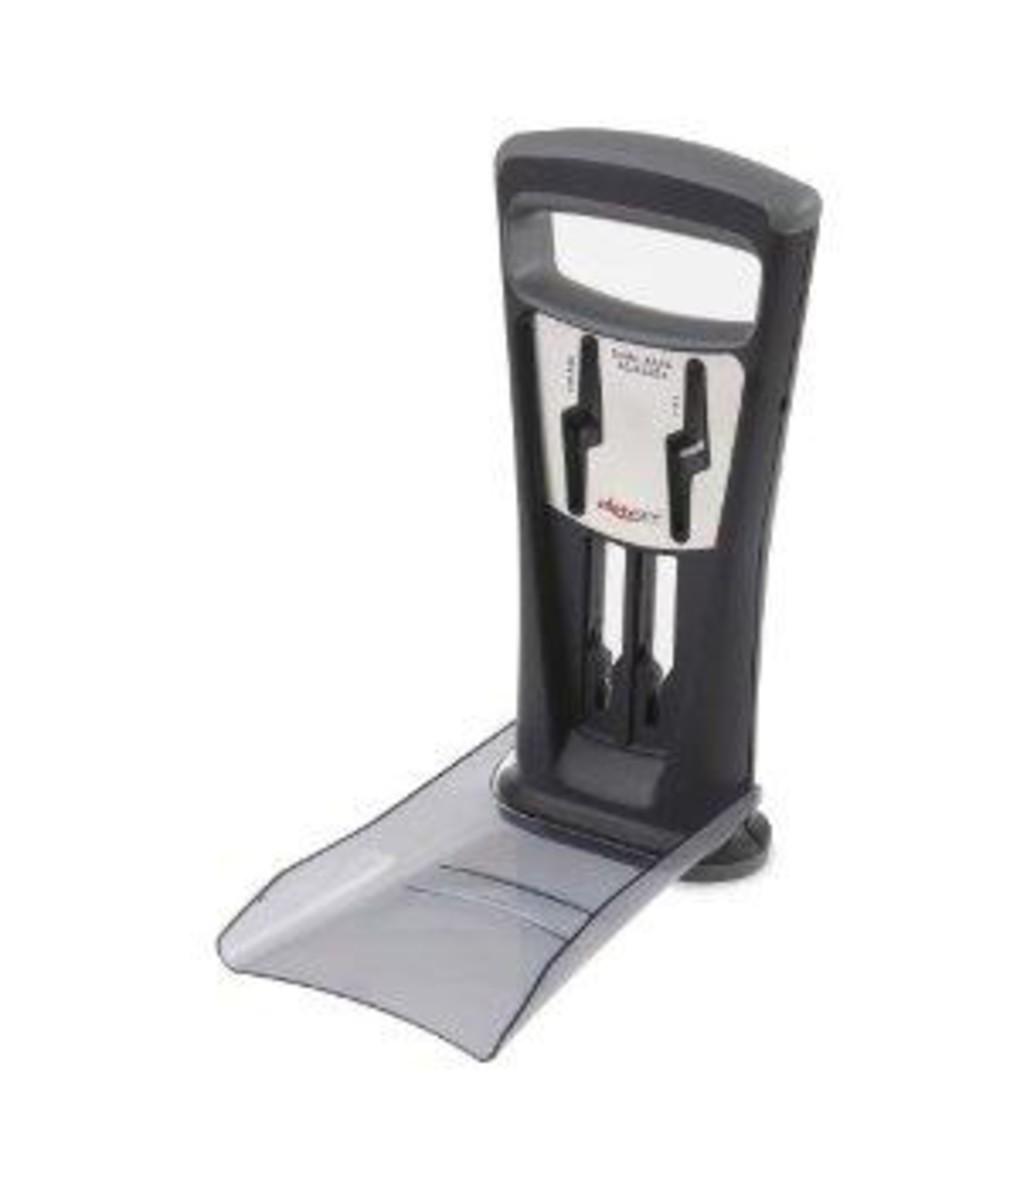 counter safe deluxe knife and scissors sharpener by kitcheniq. Black Bedroom Furniture Sets. Home Design Ideas